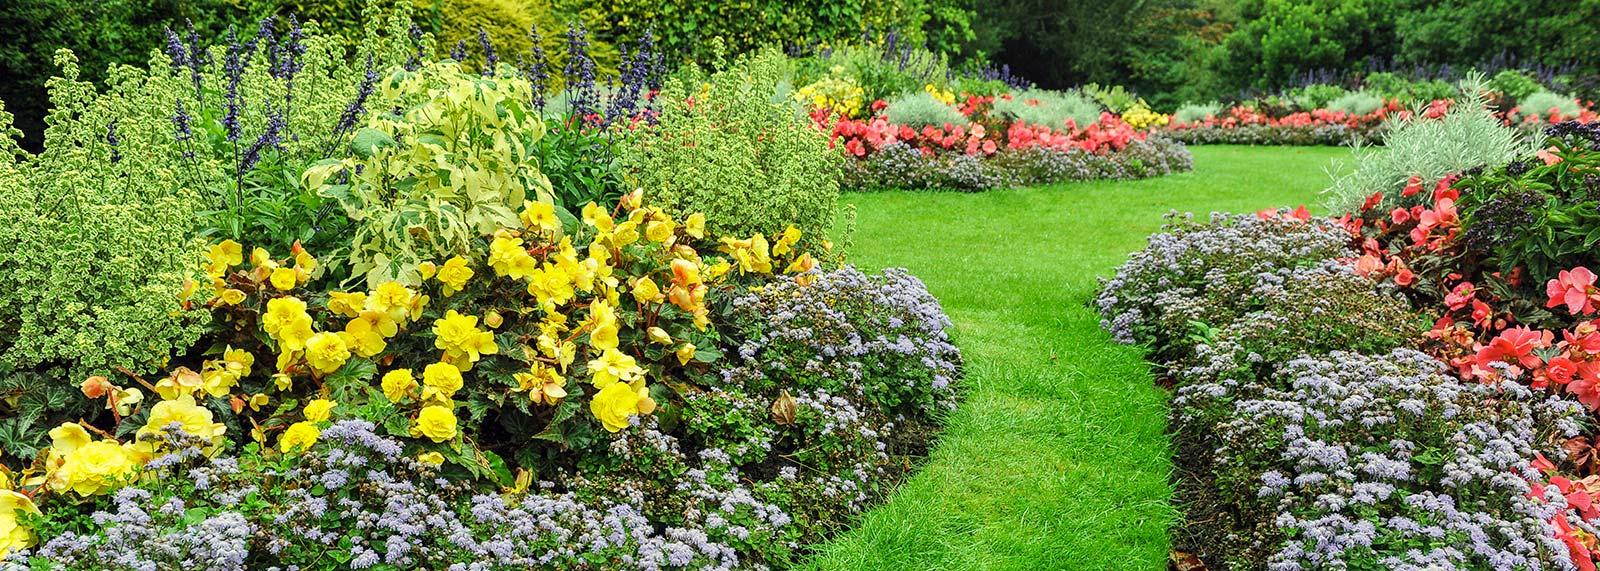 Giardini all 39 inglese dellavalle giardini for Alberelli per giardino